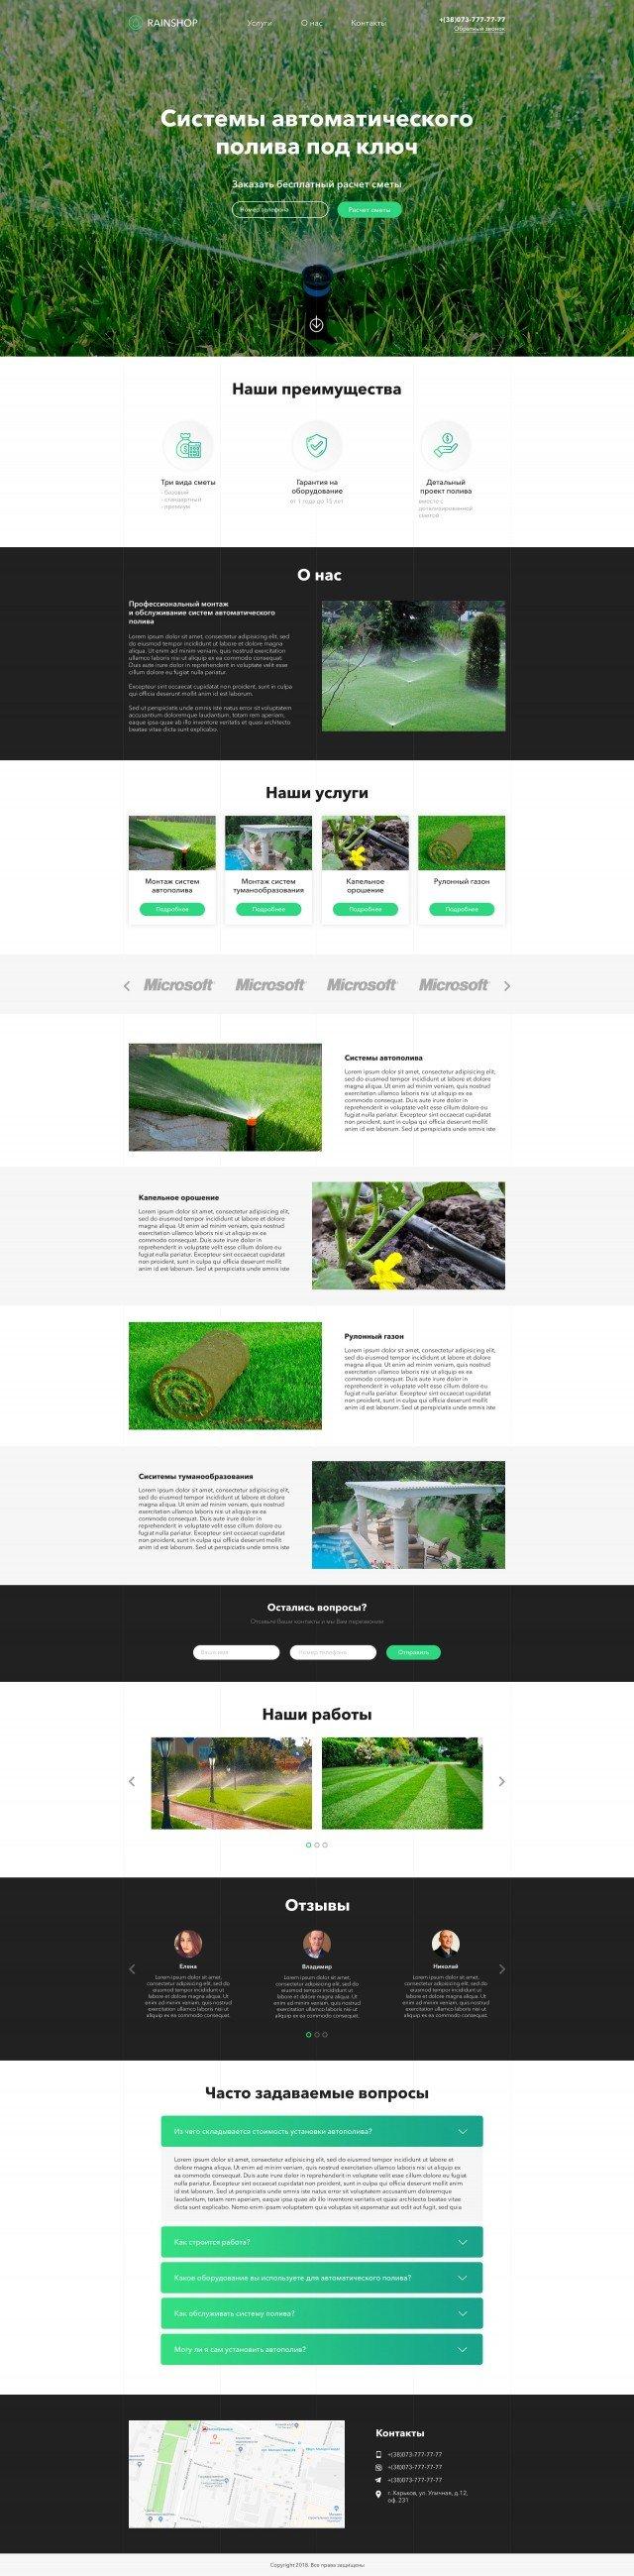 watering_system_landing_page1.jpg